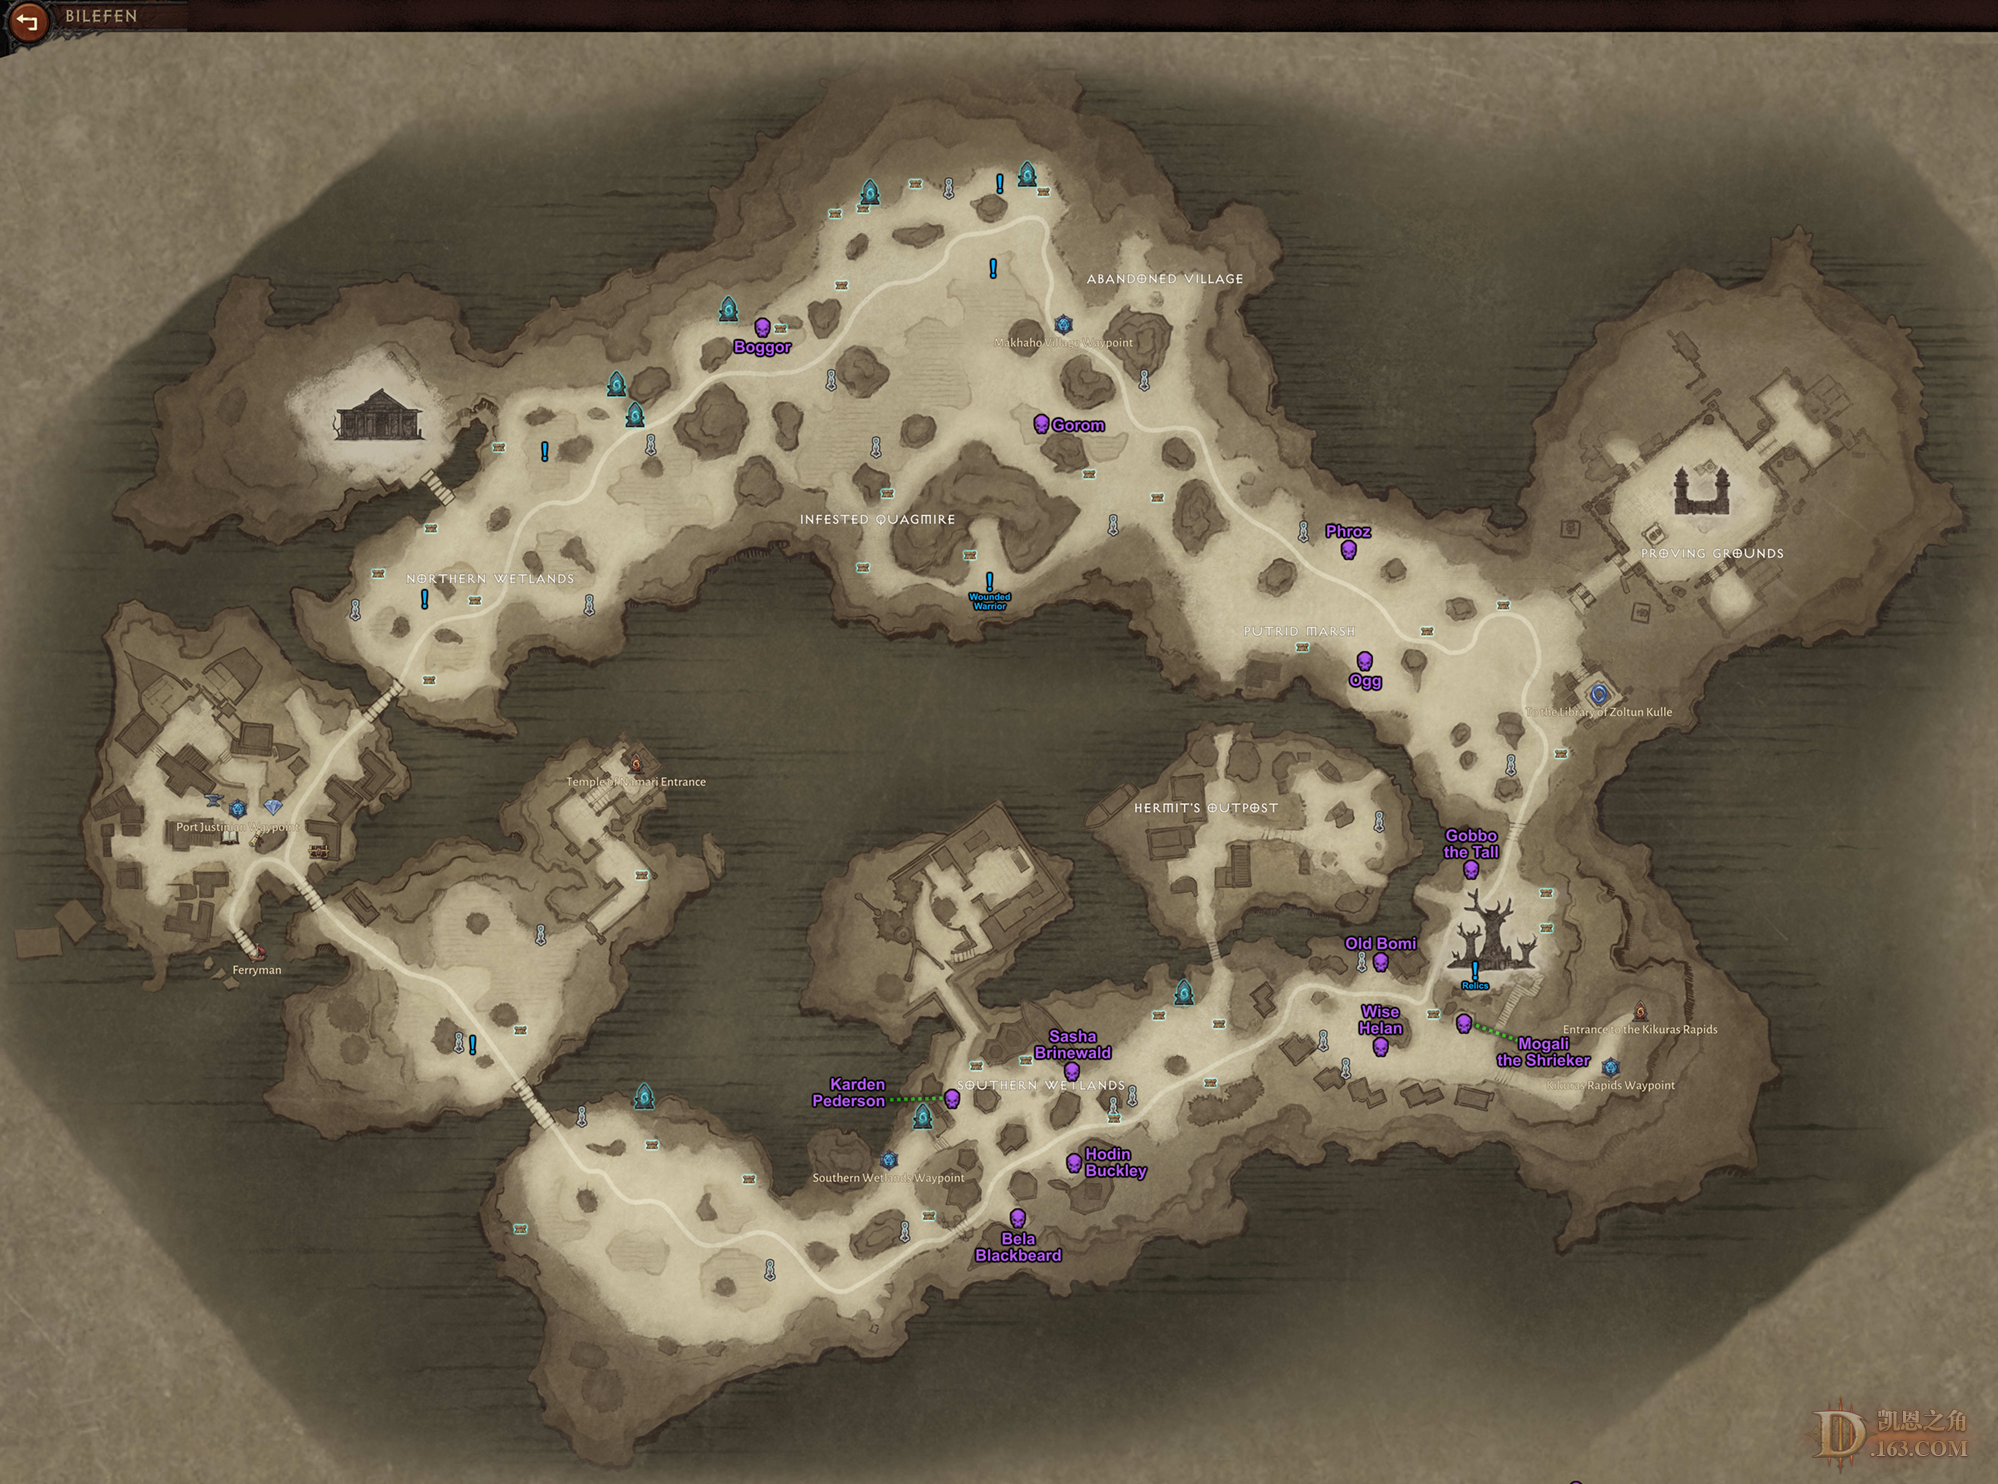 bilefen-purple-rare-elites-no-skull.png